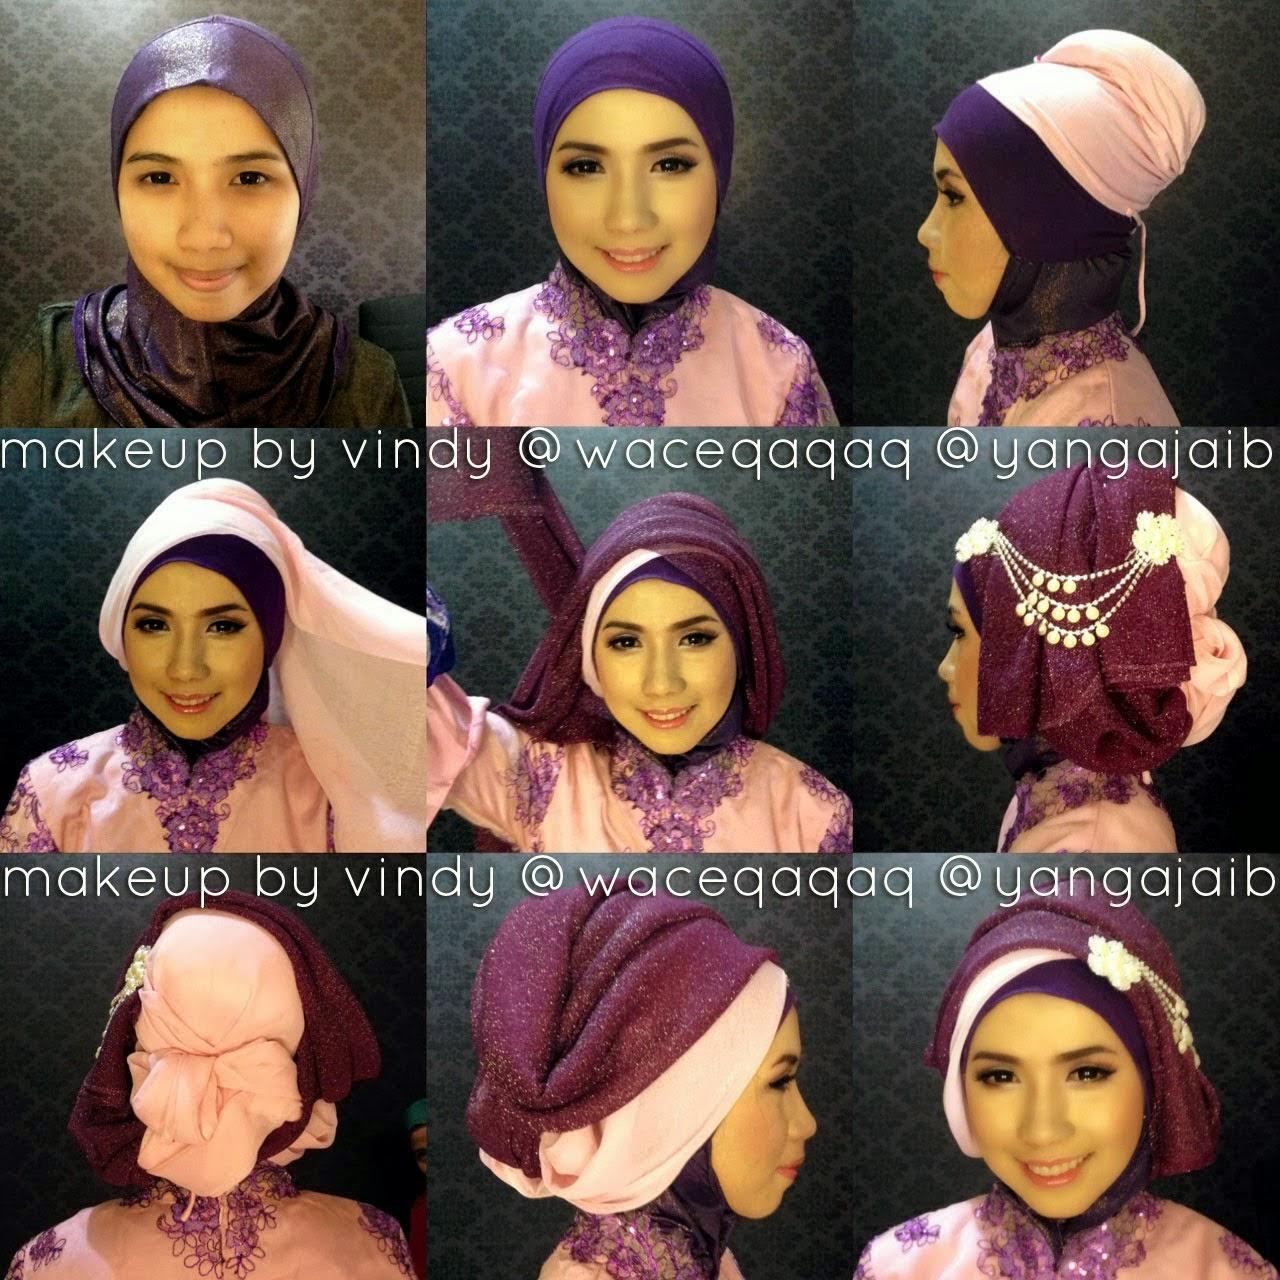 ... Untuk-Pesta-Pernikahan-cara-memakai-jilbab-kreasi-untuk-pesta-143-.jpg